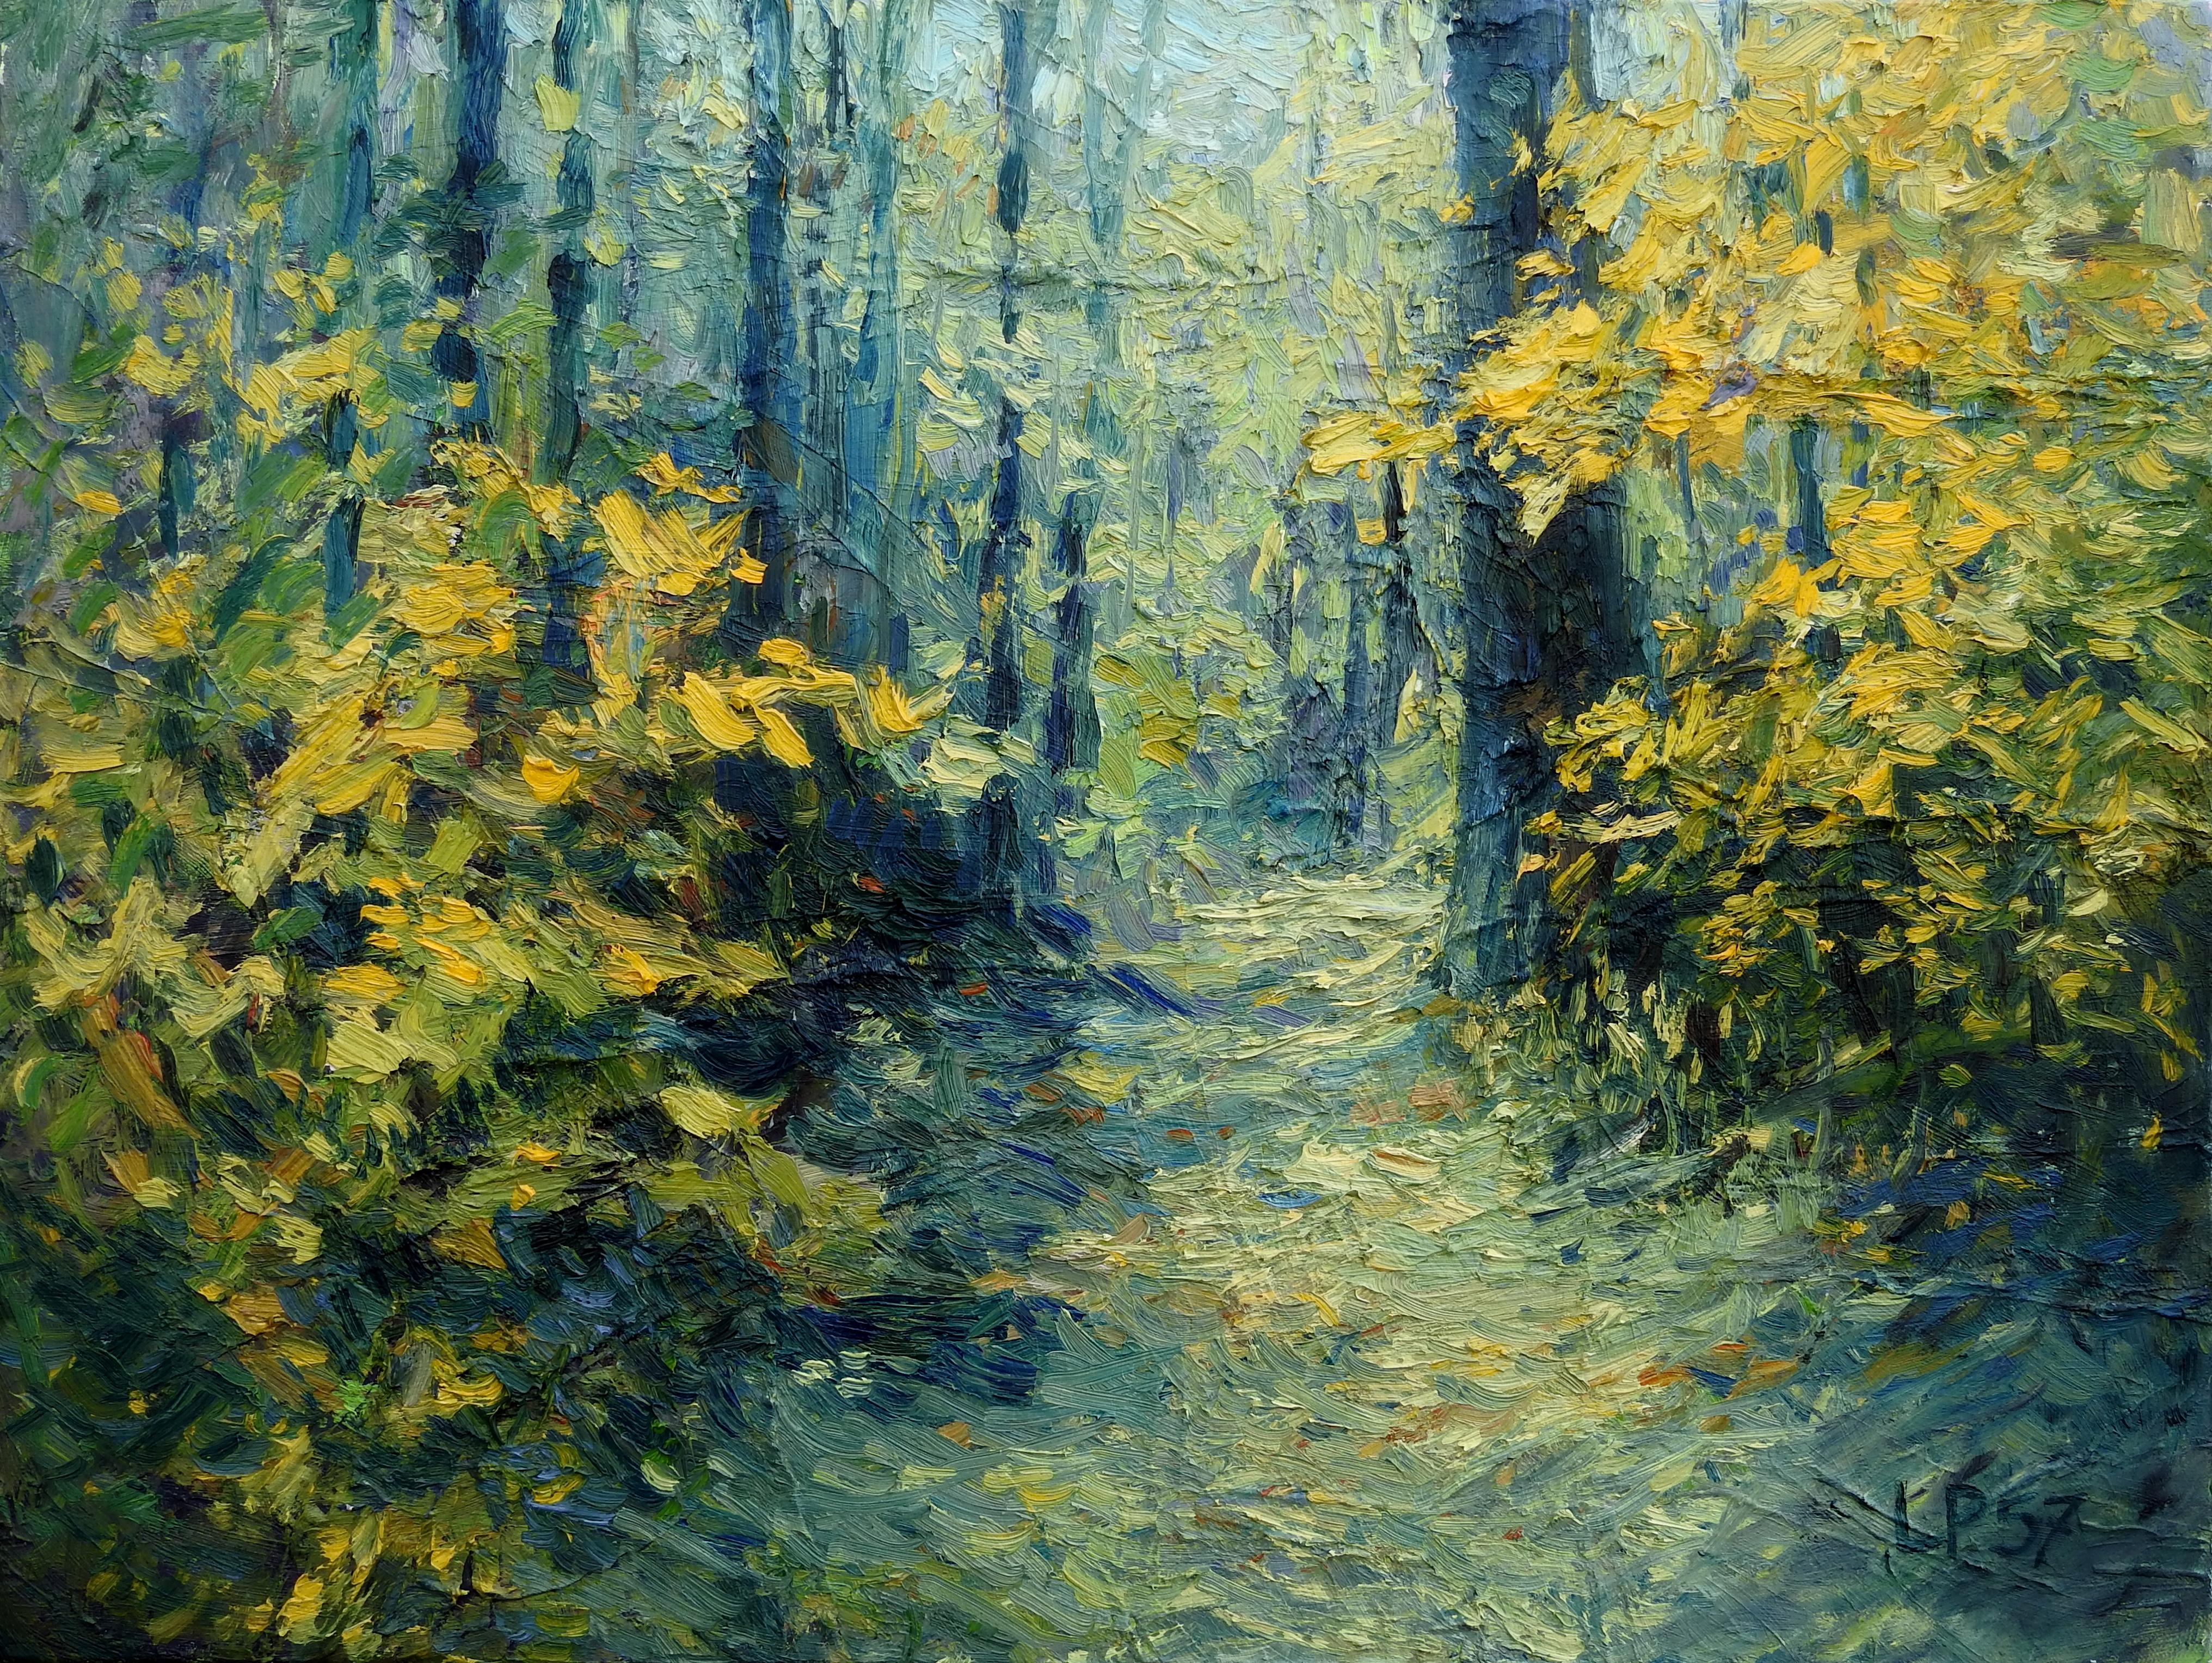 Follow the Yellow Path